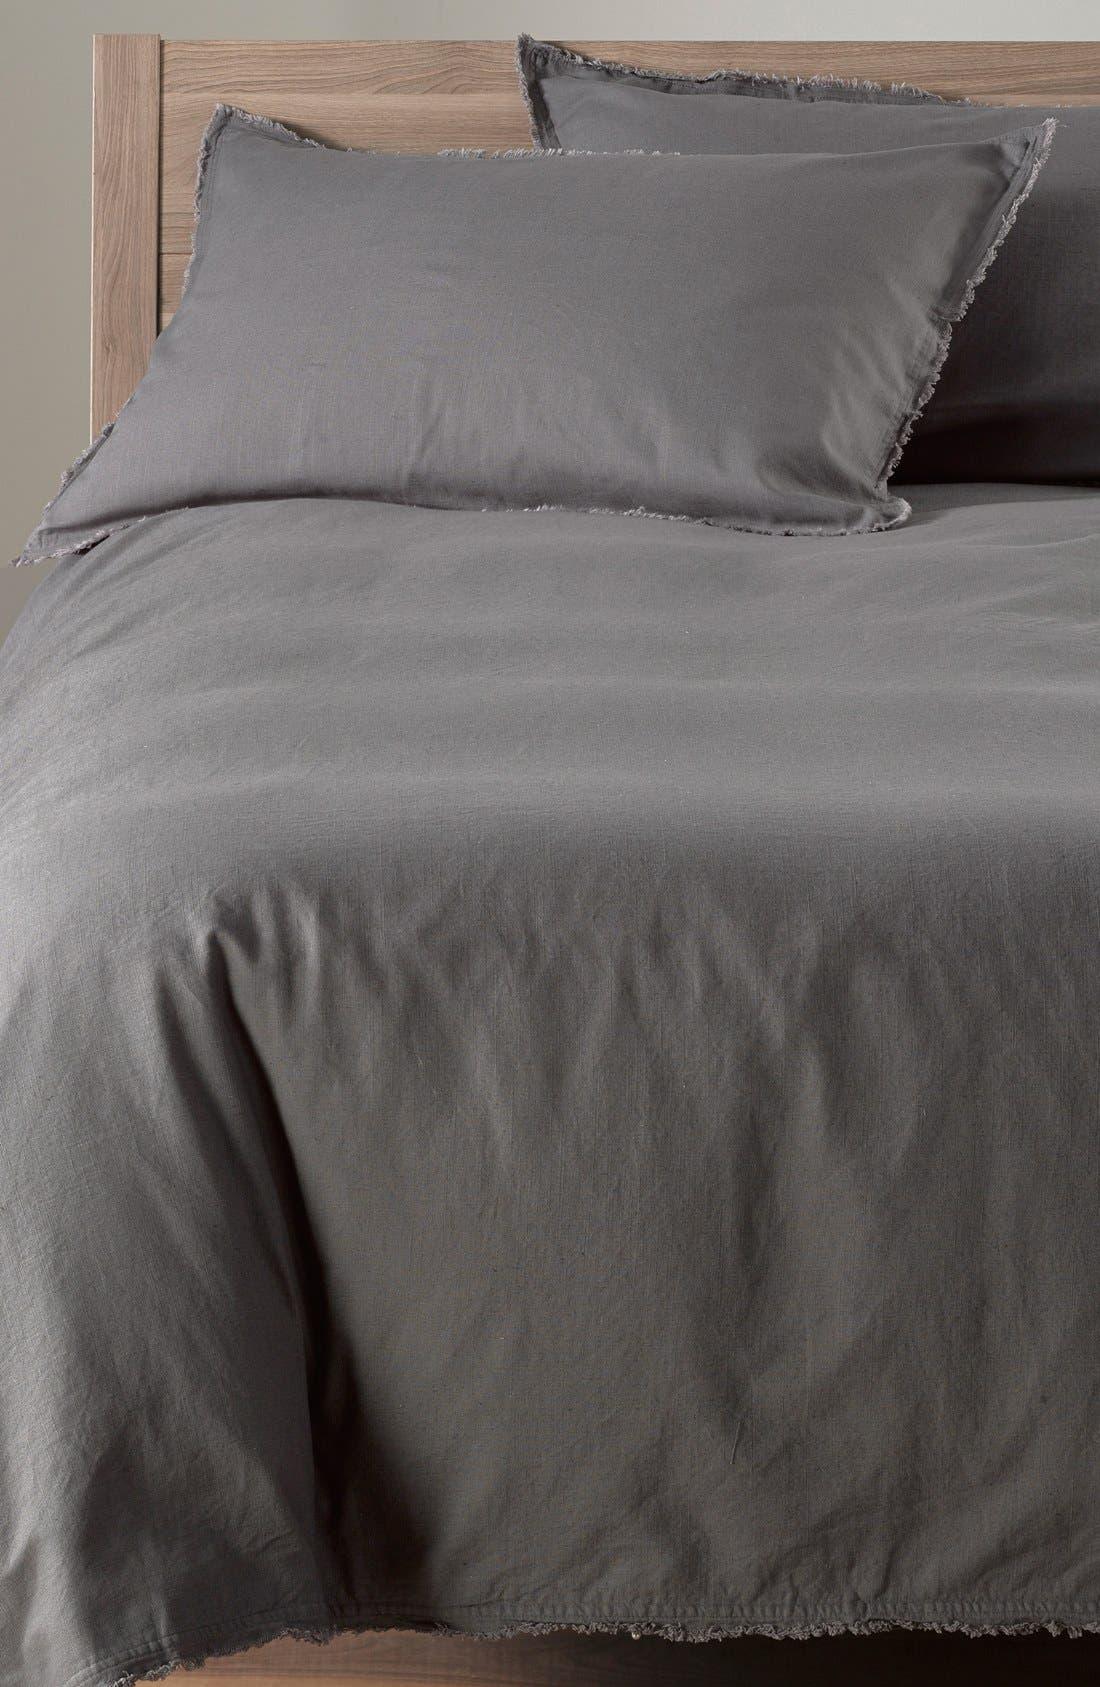 NORDSTROM AT HOME 'Terra' Cotton & Linen Duvet Cover, Main, color, 021